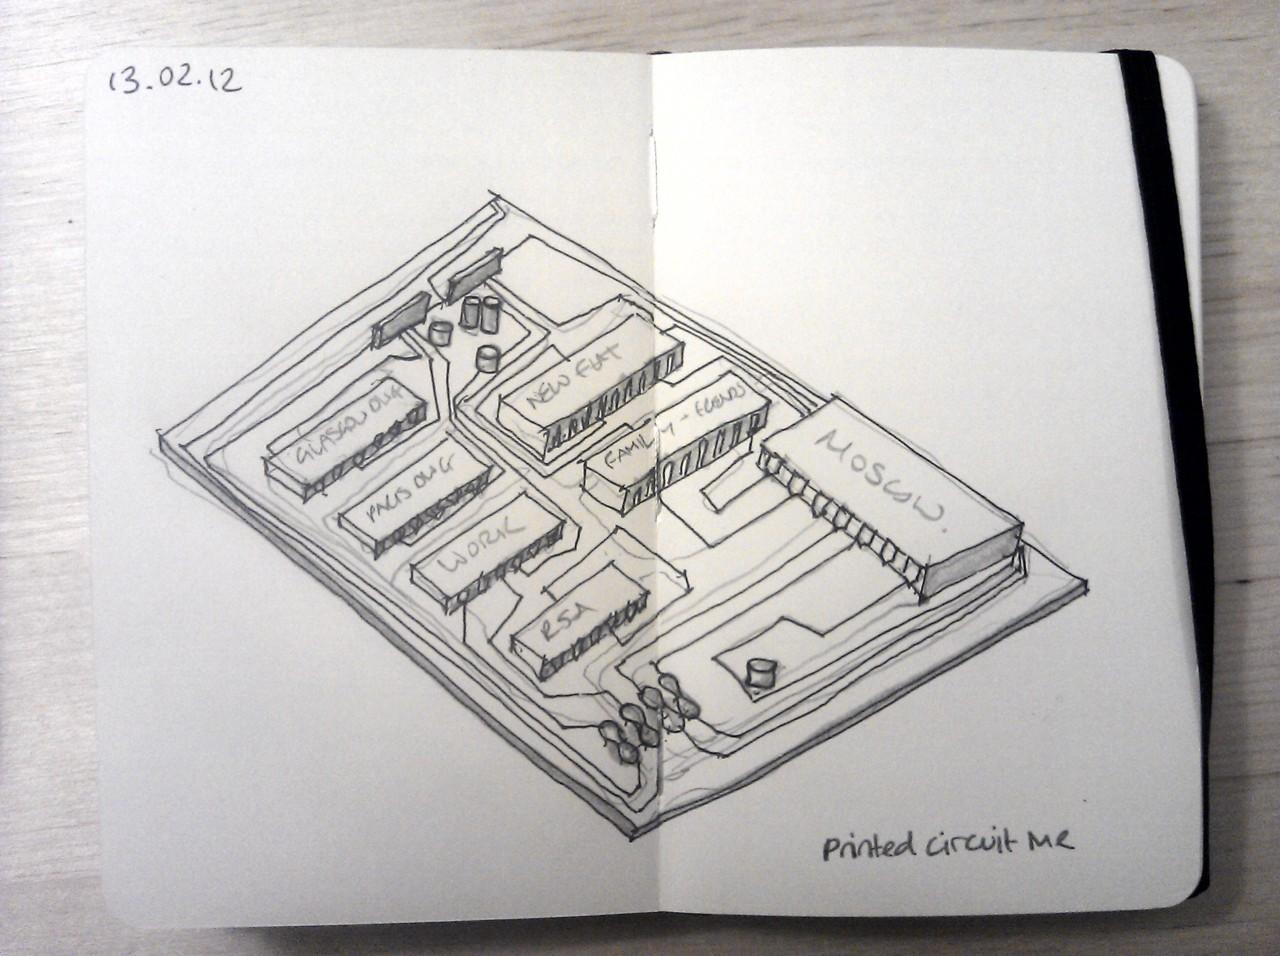 365 drawings later … day 42 … printed circuit me